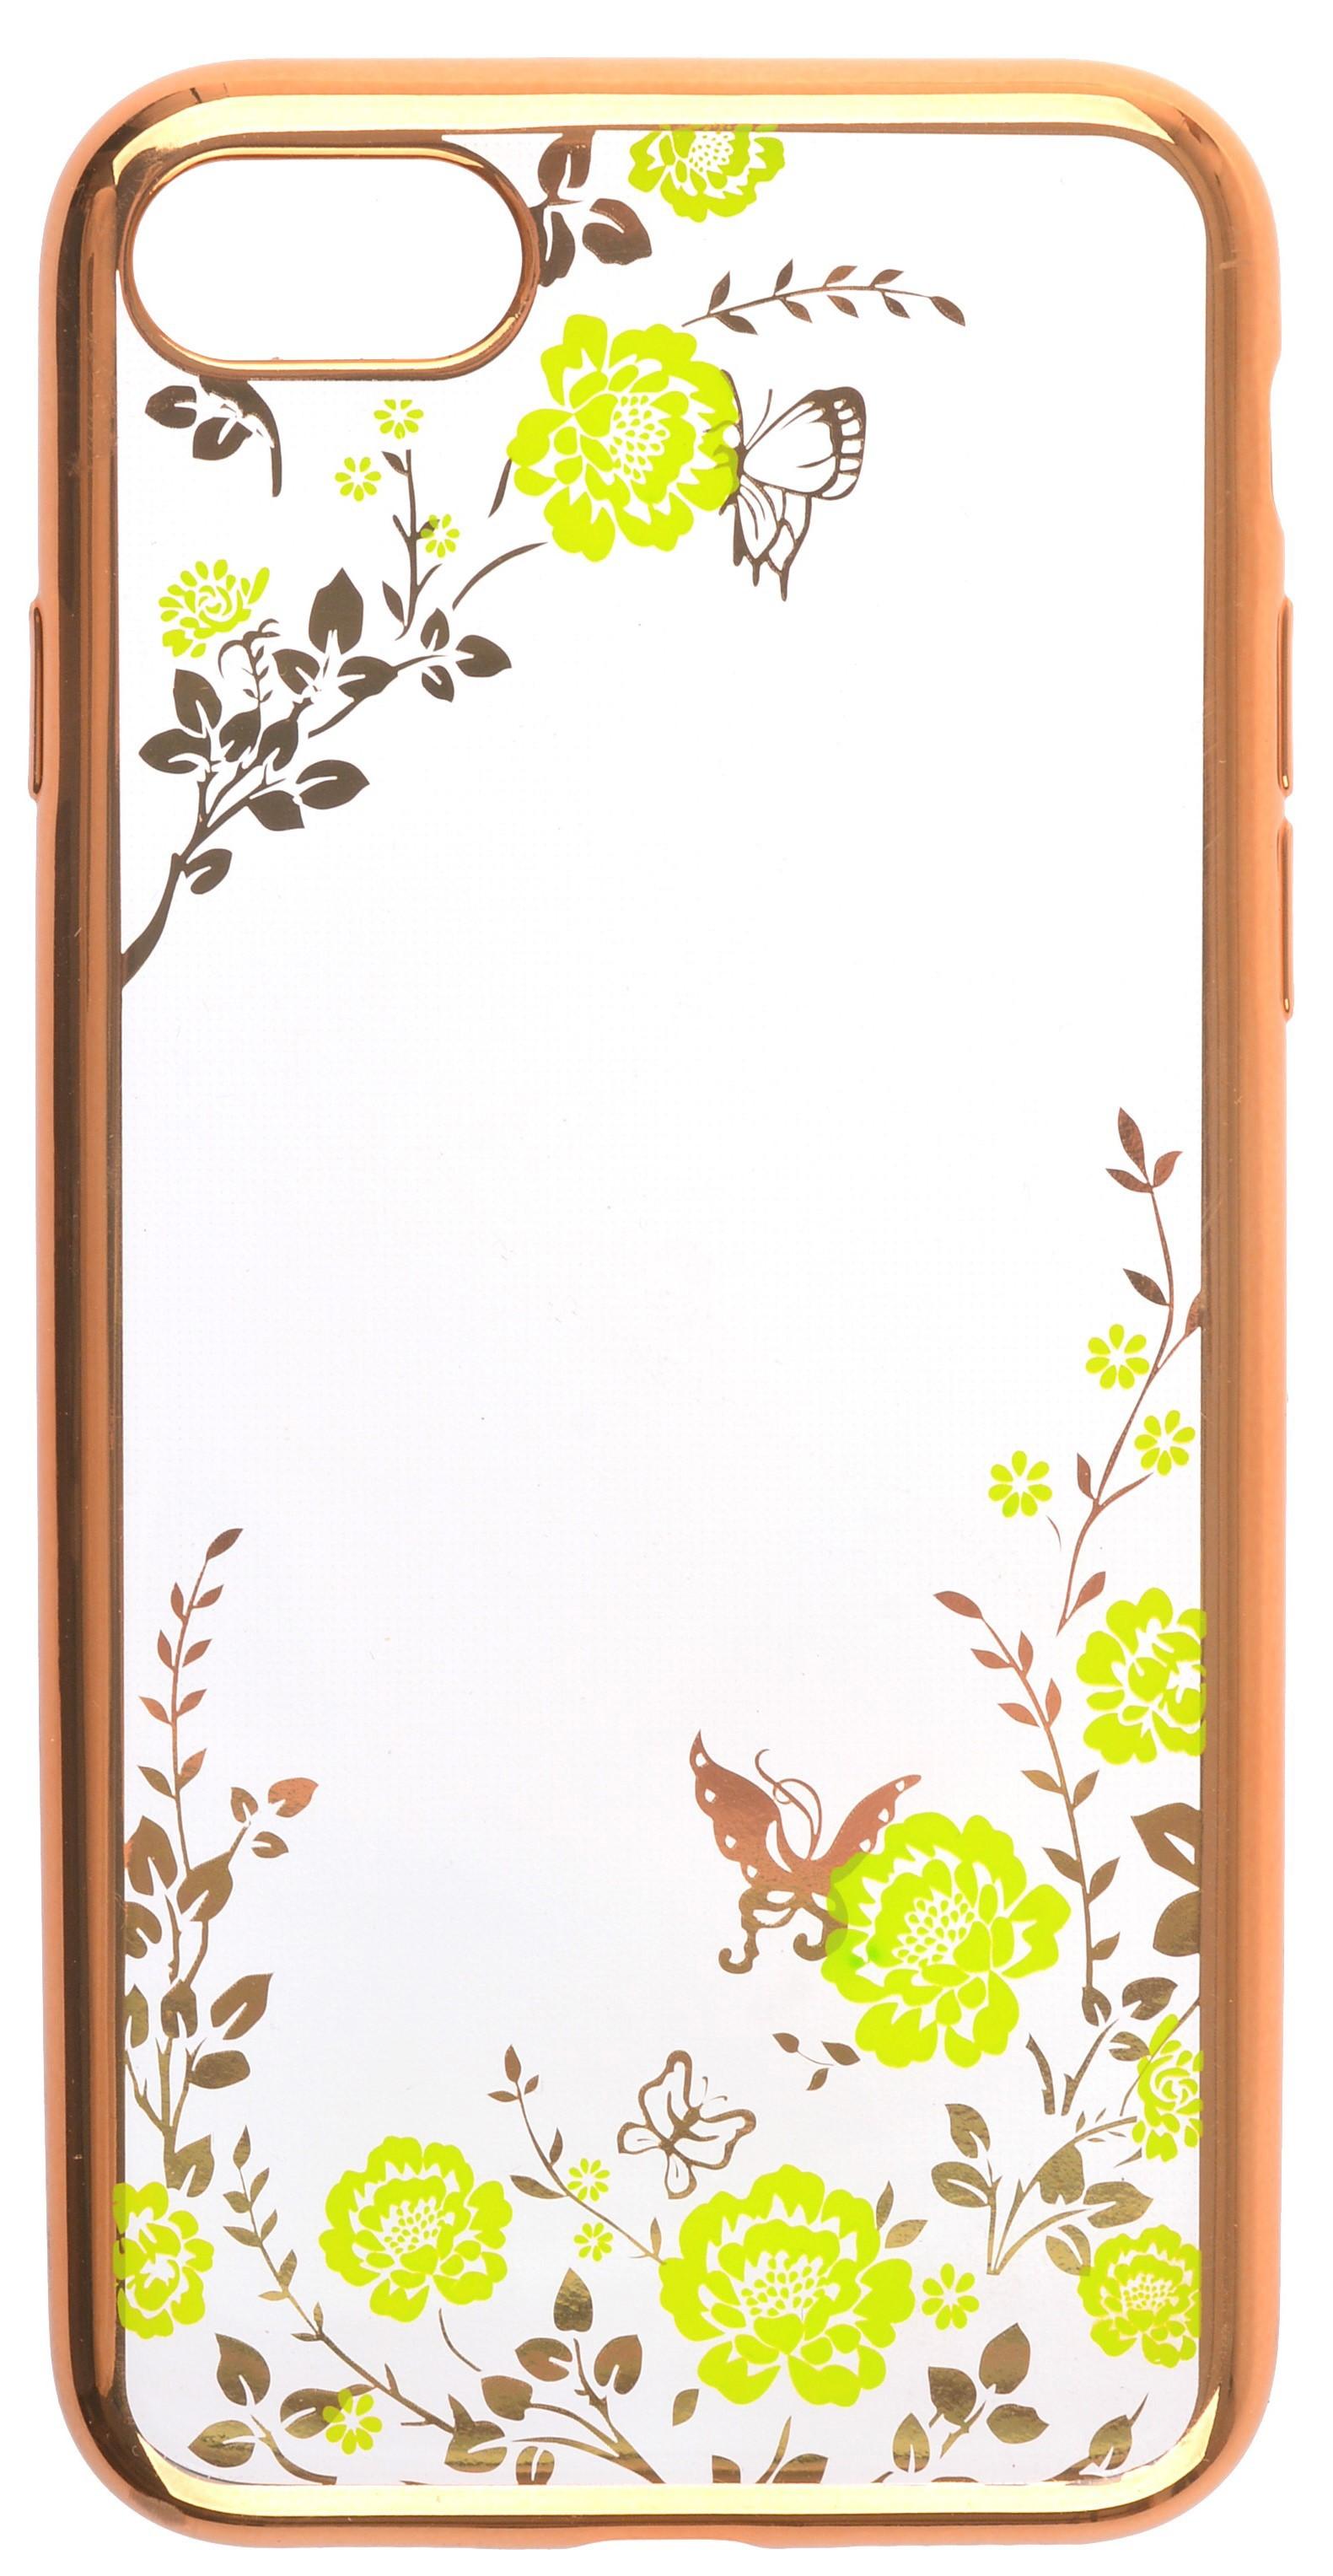 Чехол для сотового телефона skinBOX silicone chrome border color style 1, 4630042529175, зеленый skinbox silicone chrome border color style 1 4people чехол для apple iphone 7 8 green